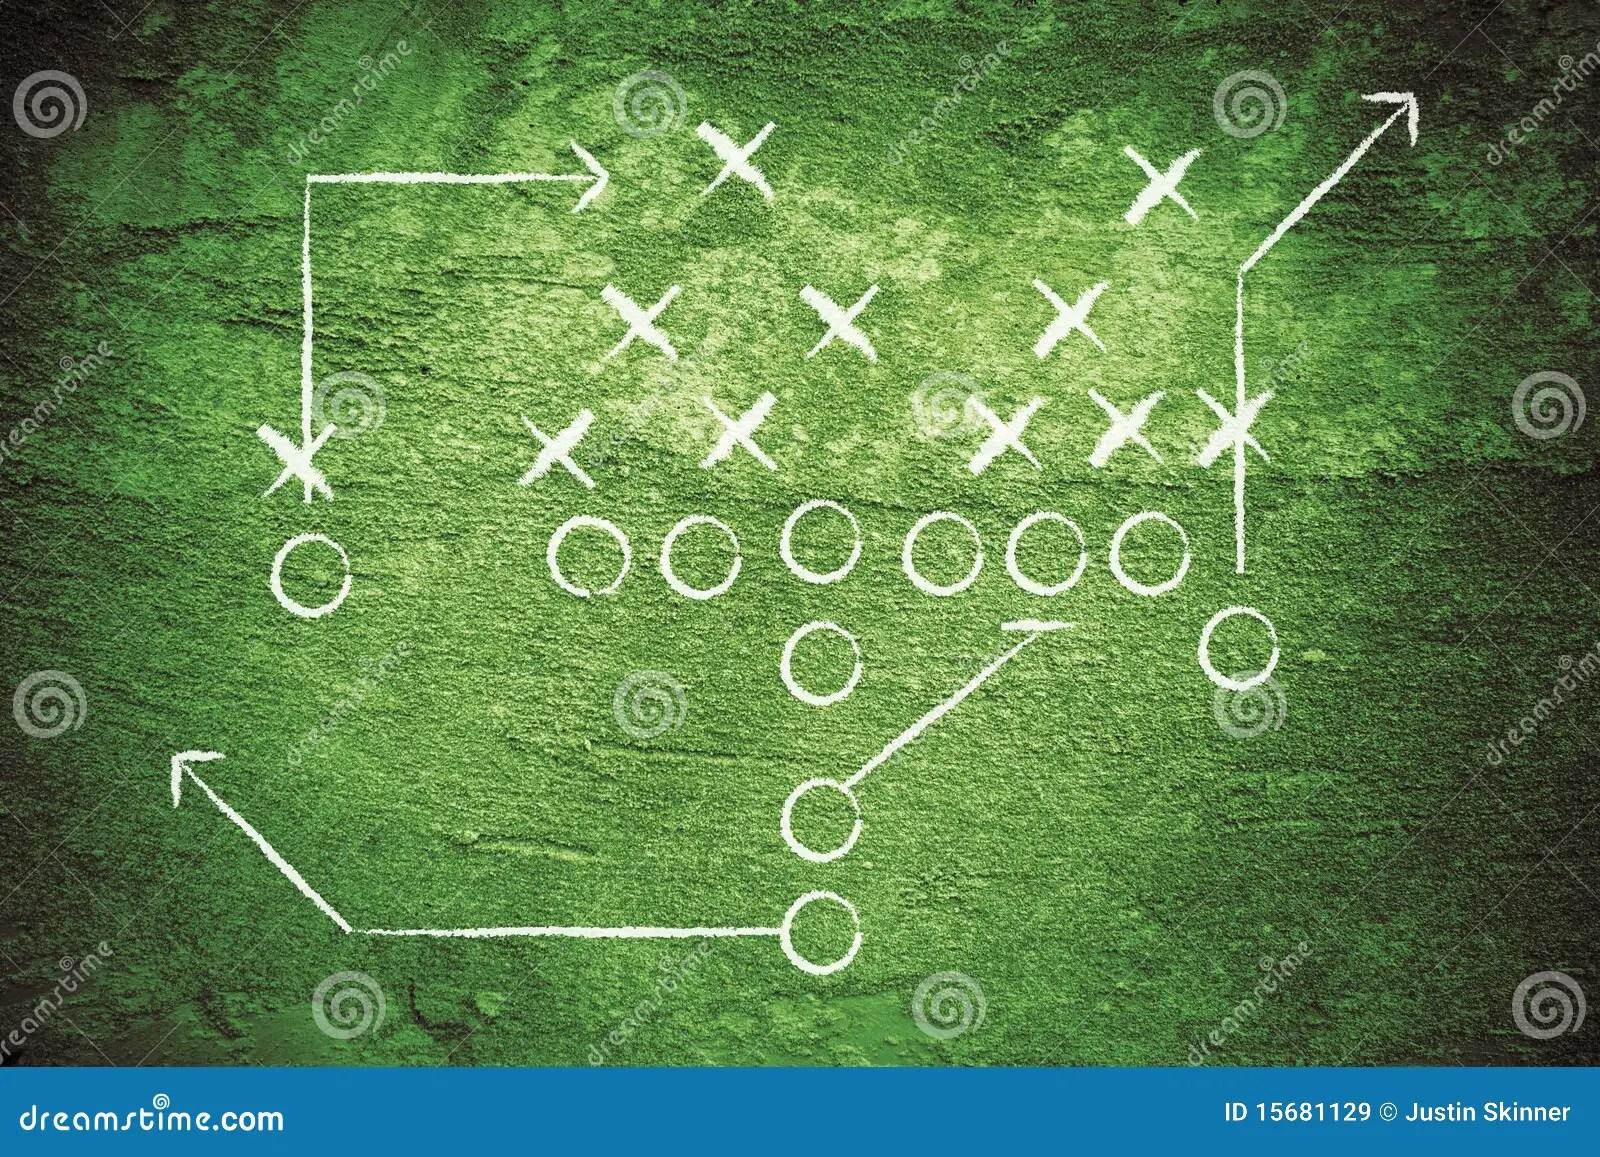 5 3 defense diagram 1995 nissan pickup wiring grunge football play royalty free stock images - image: 15681129